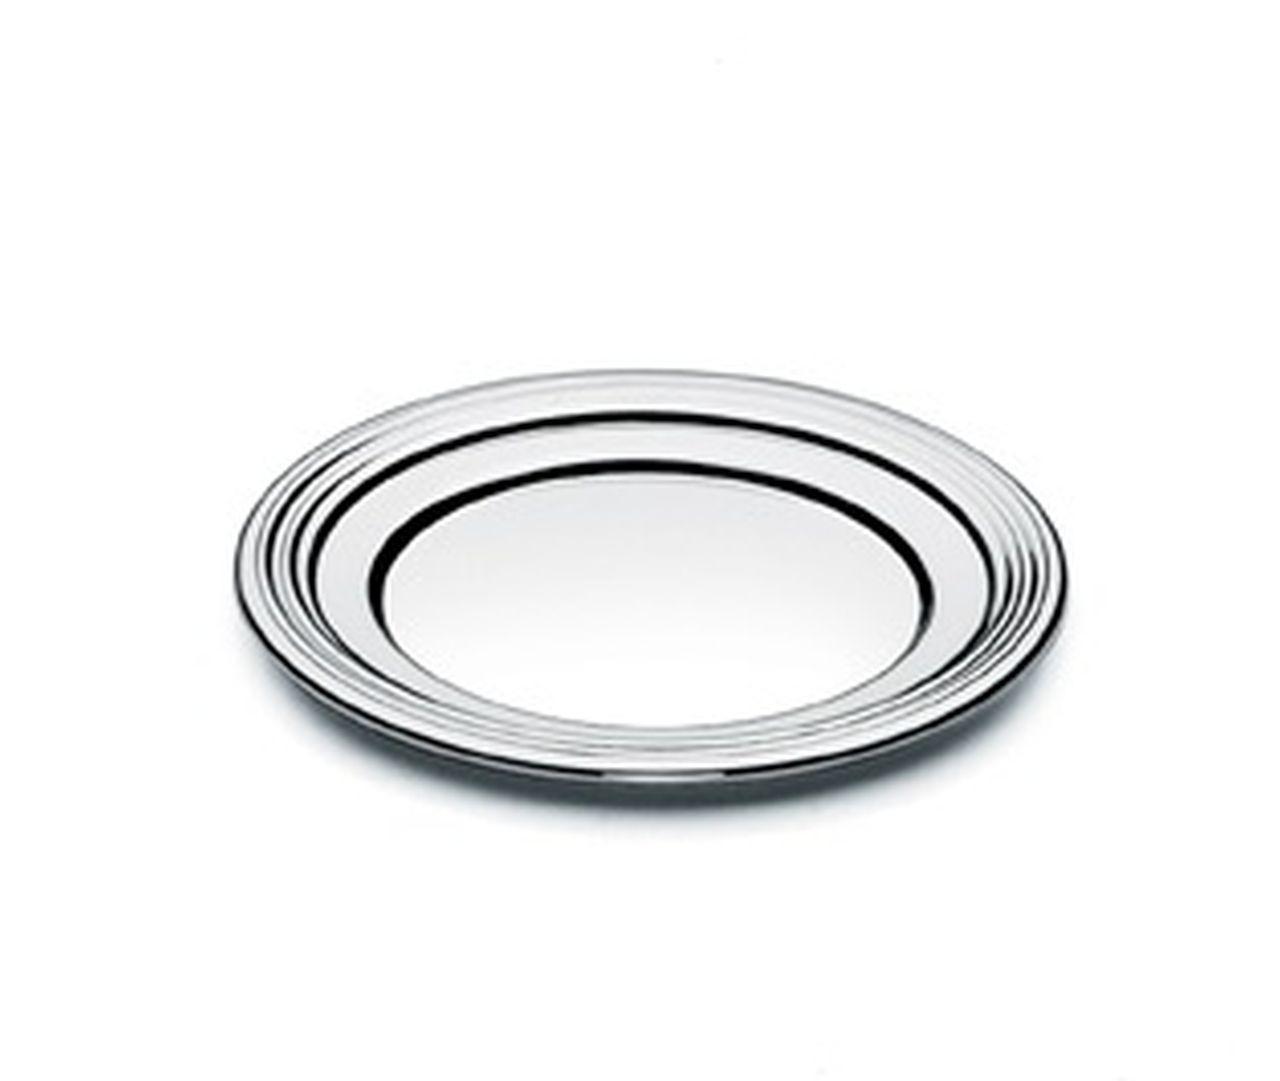 Piattino pane argentato argento stile Inglese cm.diam.11